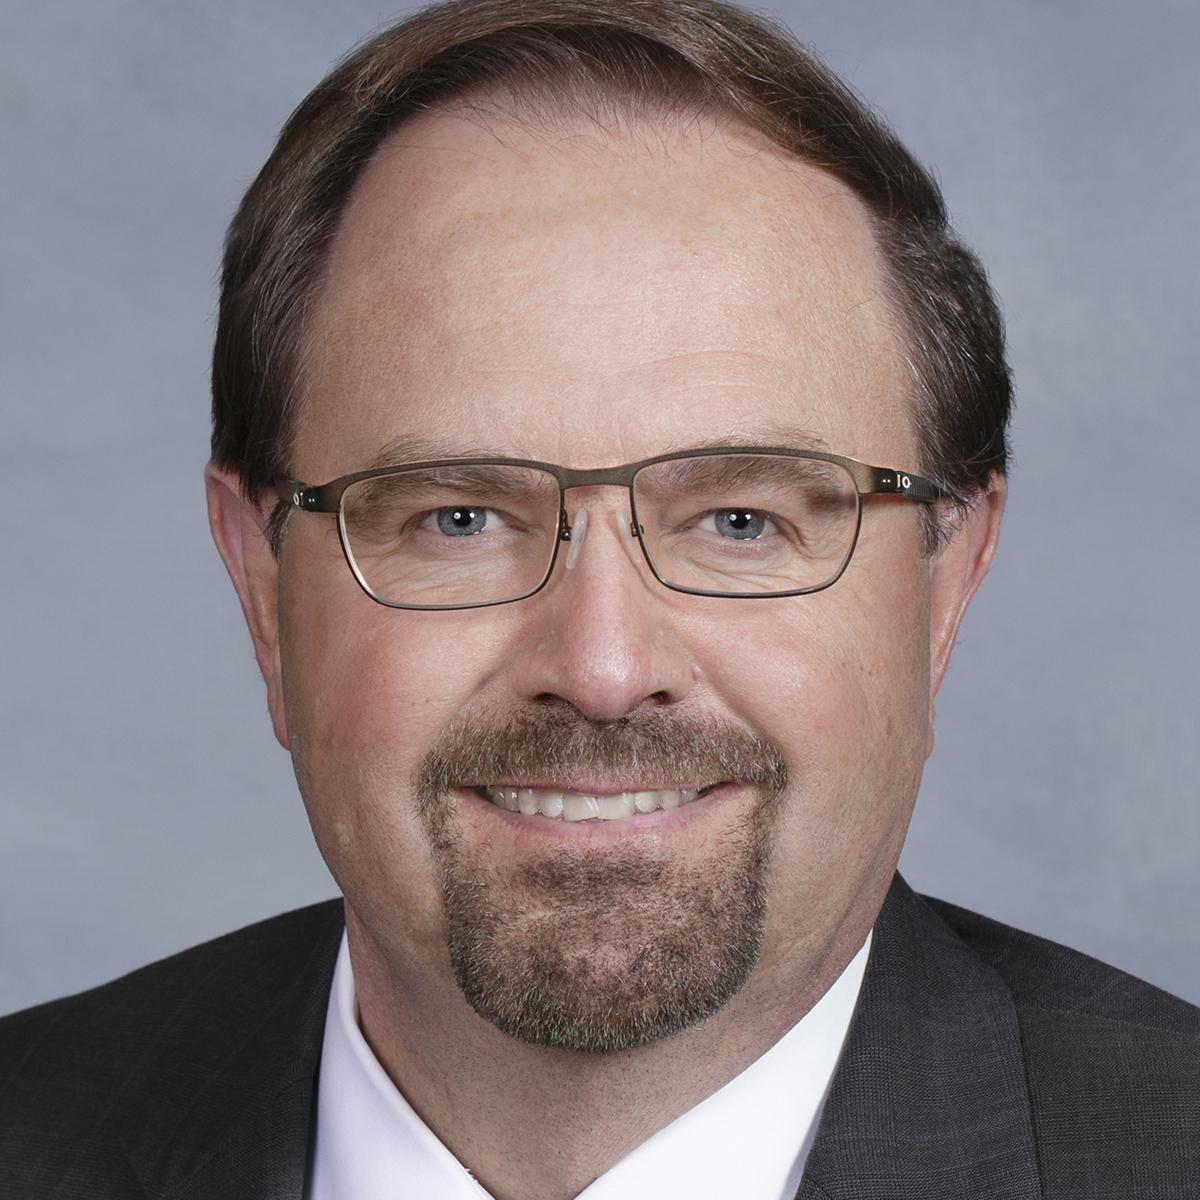 Senator Chuck Edwards